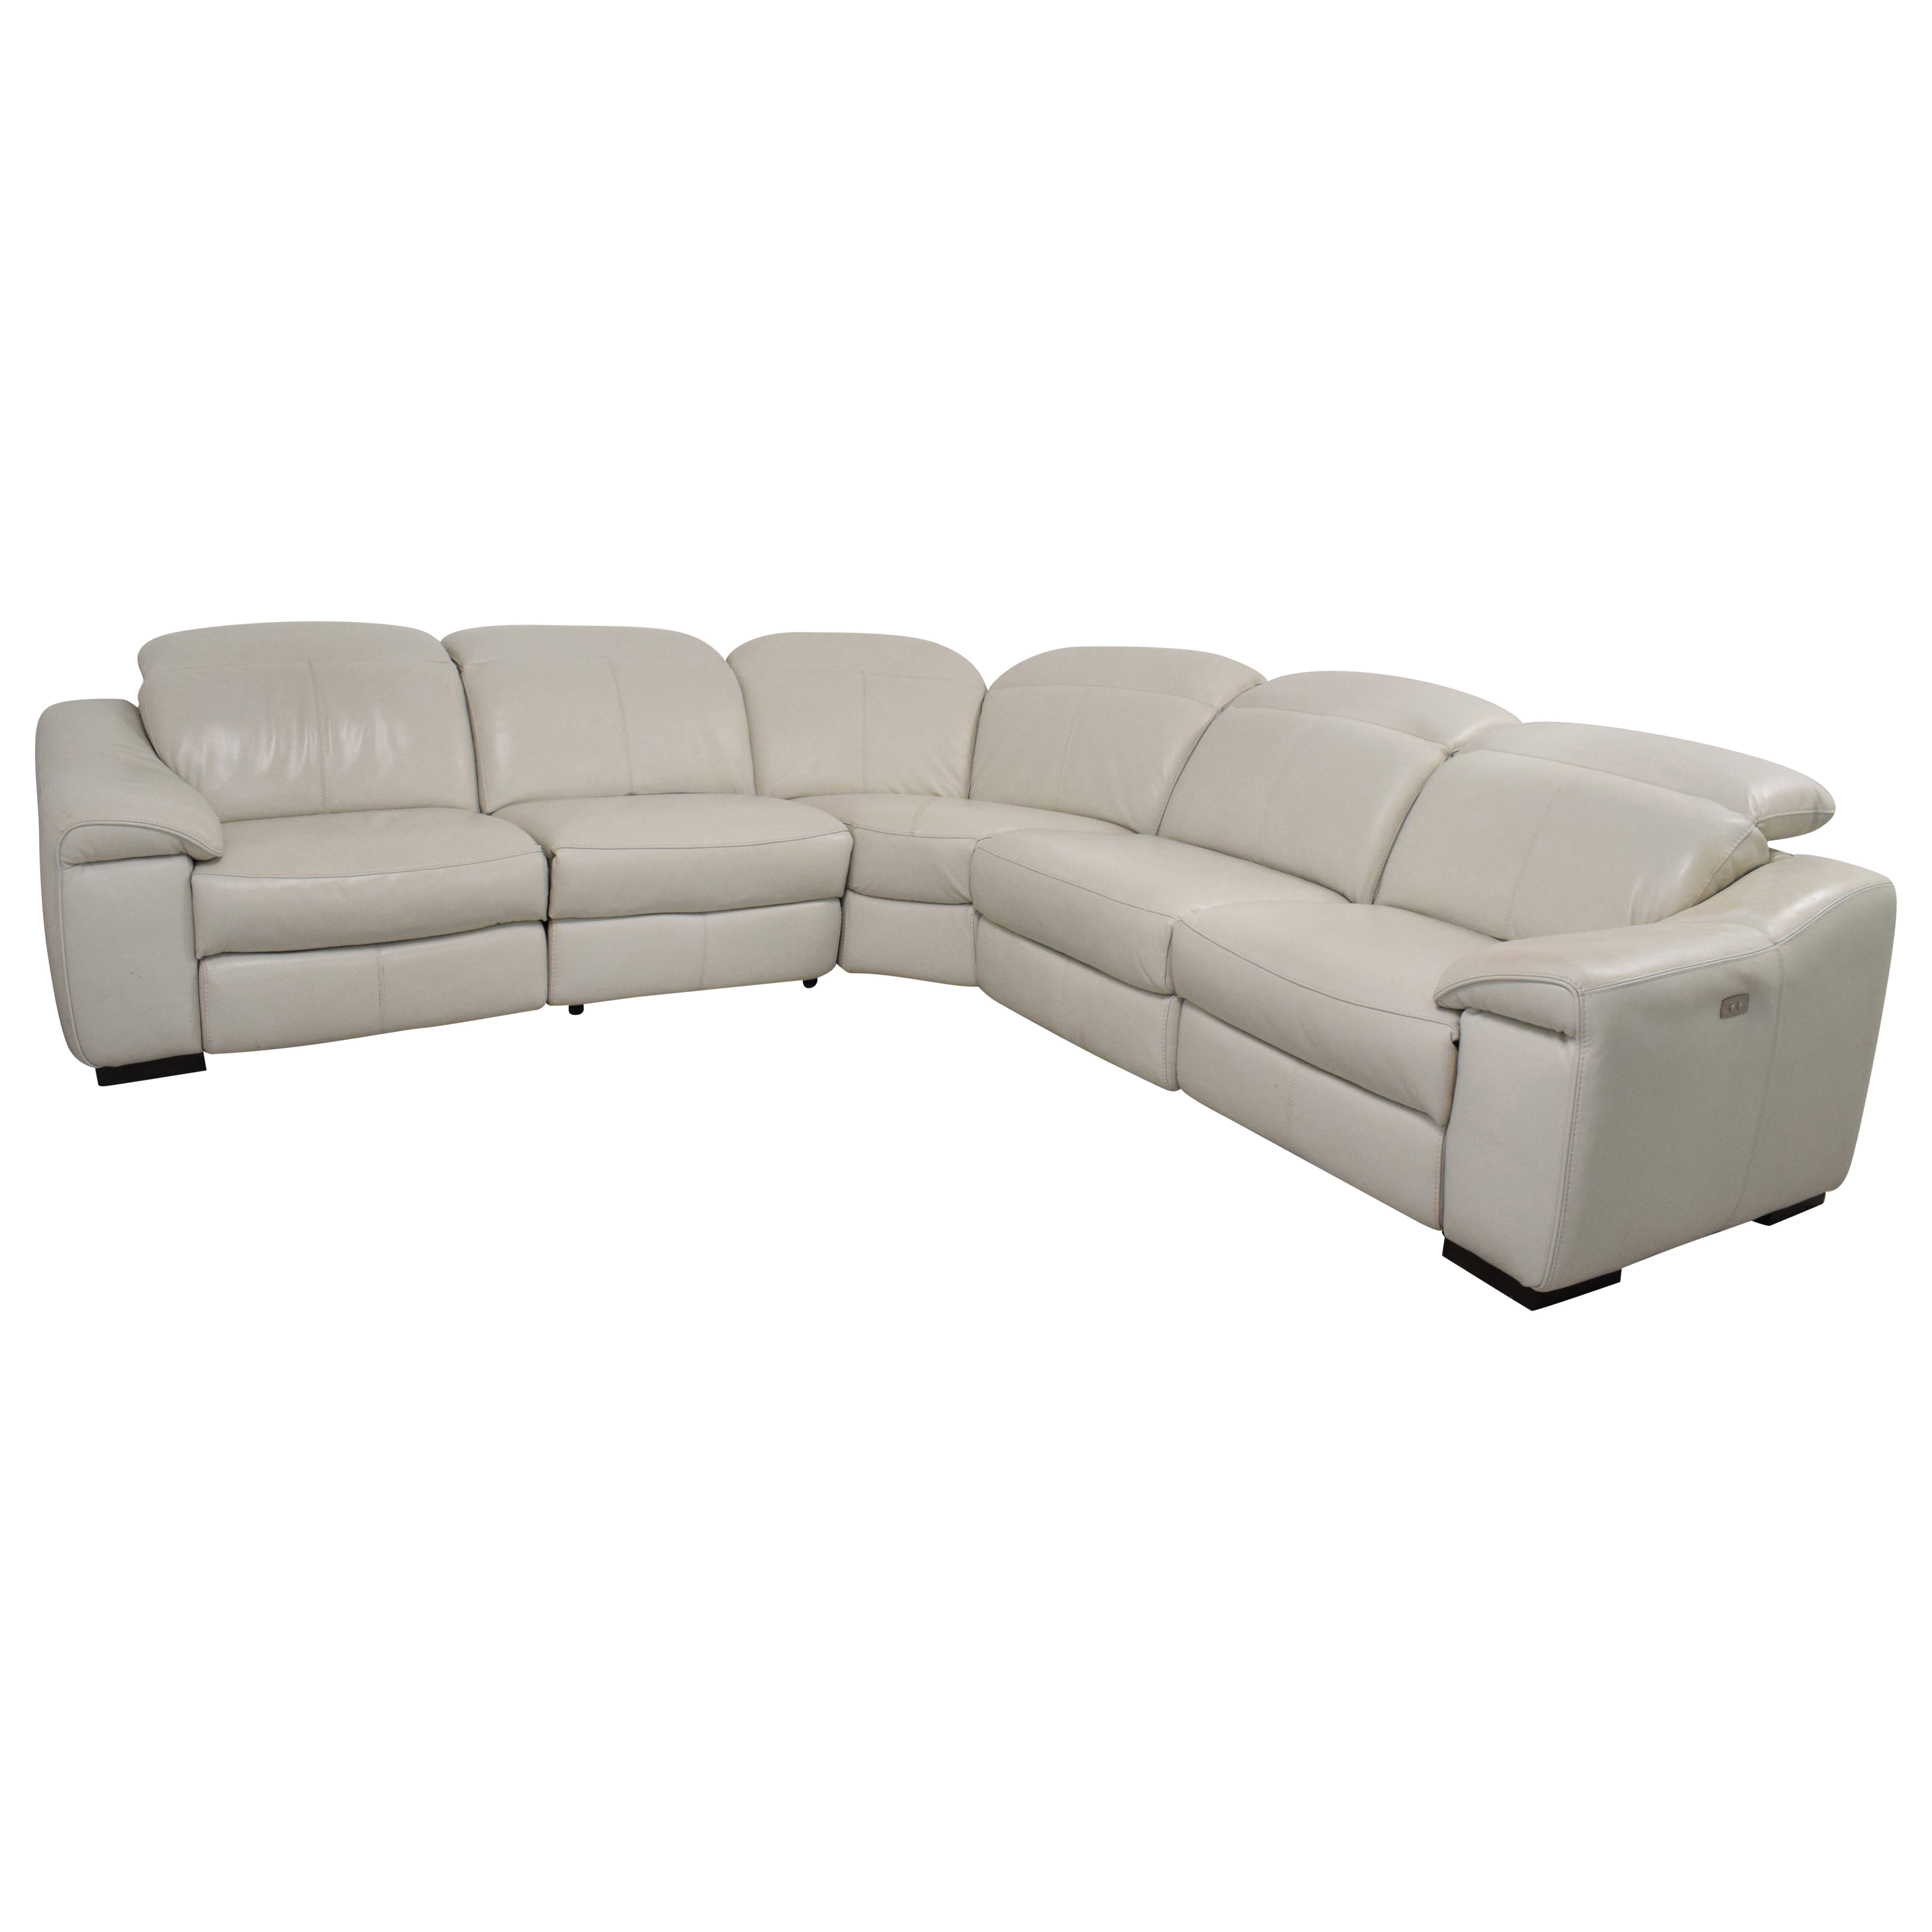 Macy's Macy's Power Reclining Sectional Sofa used